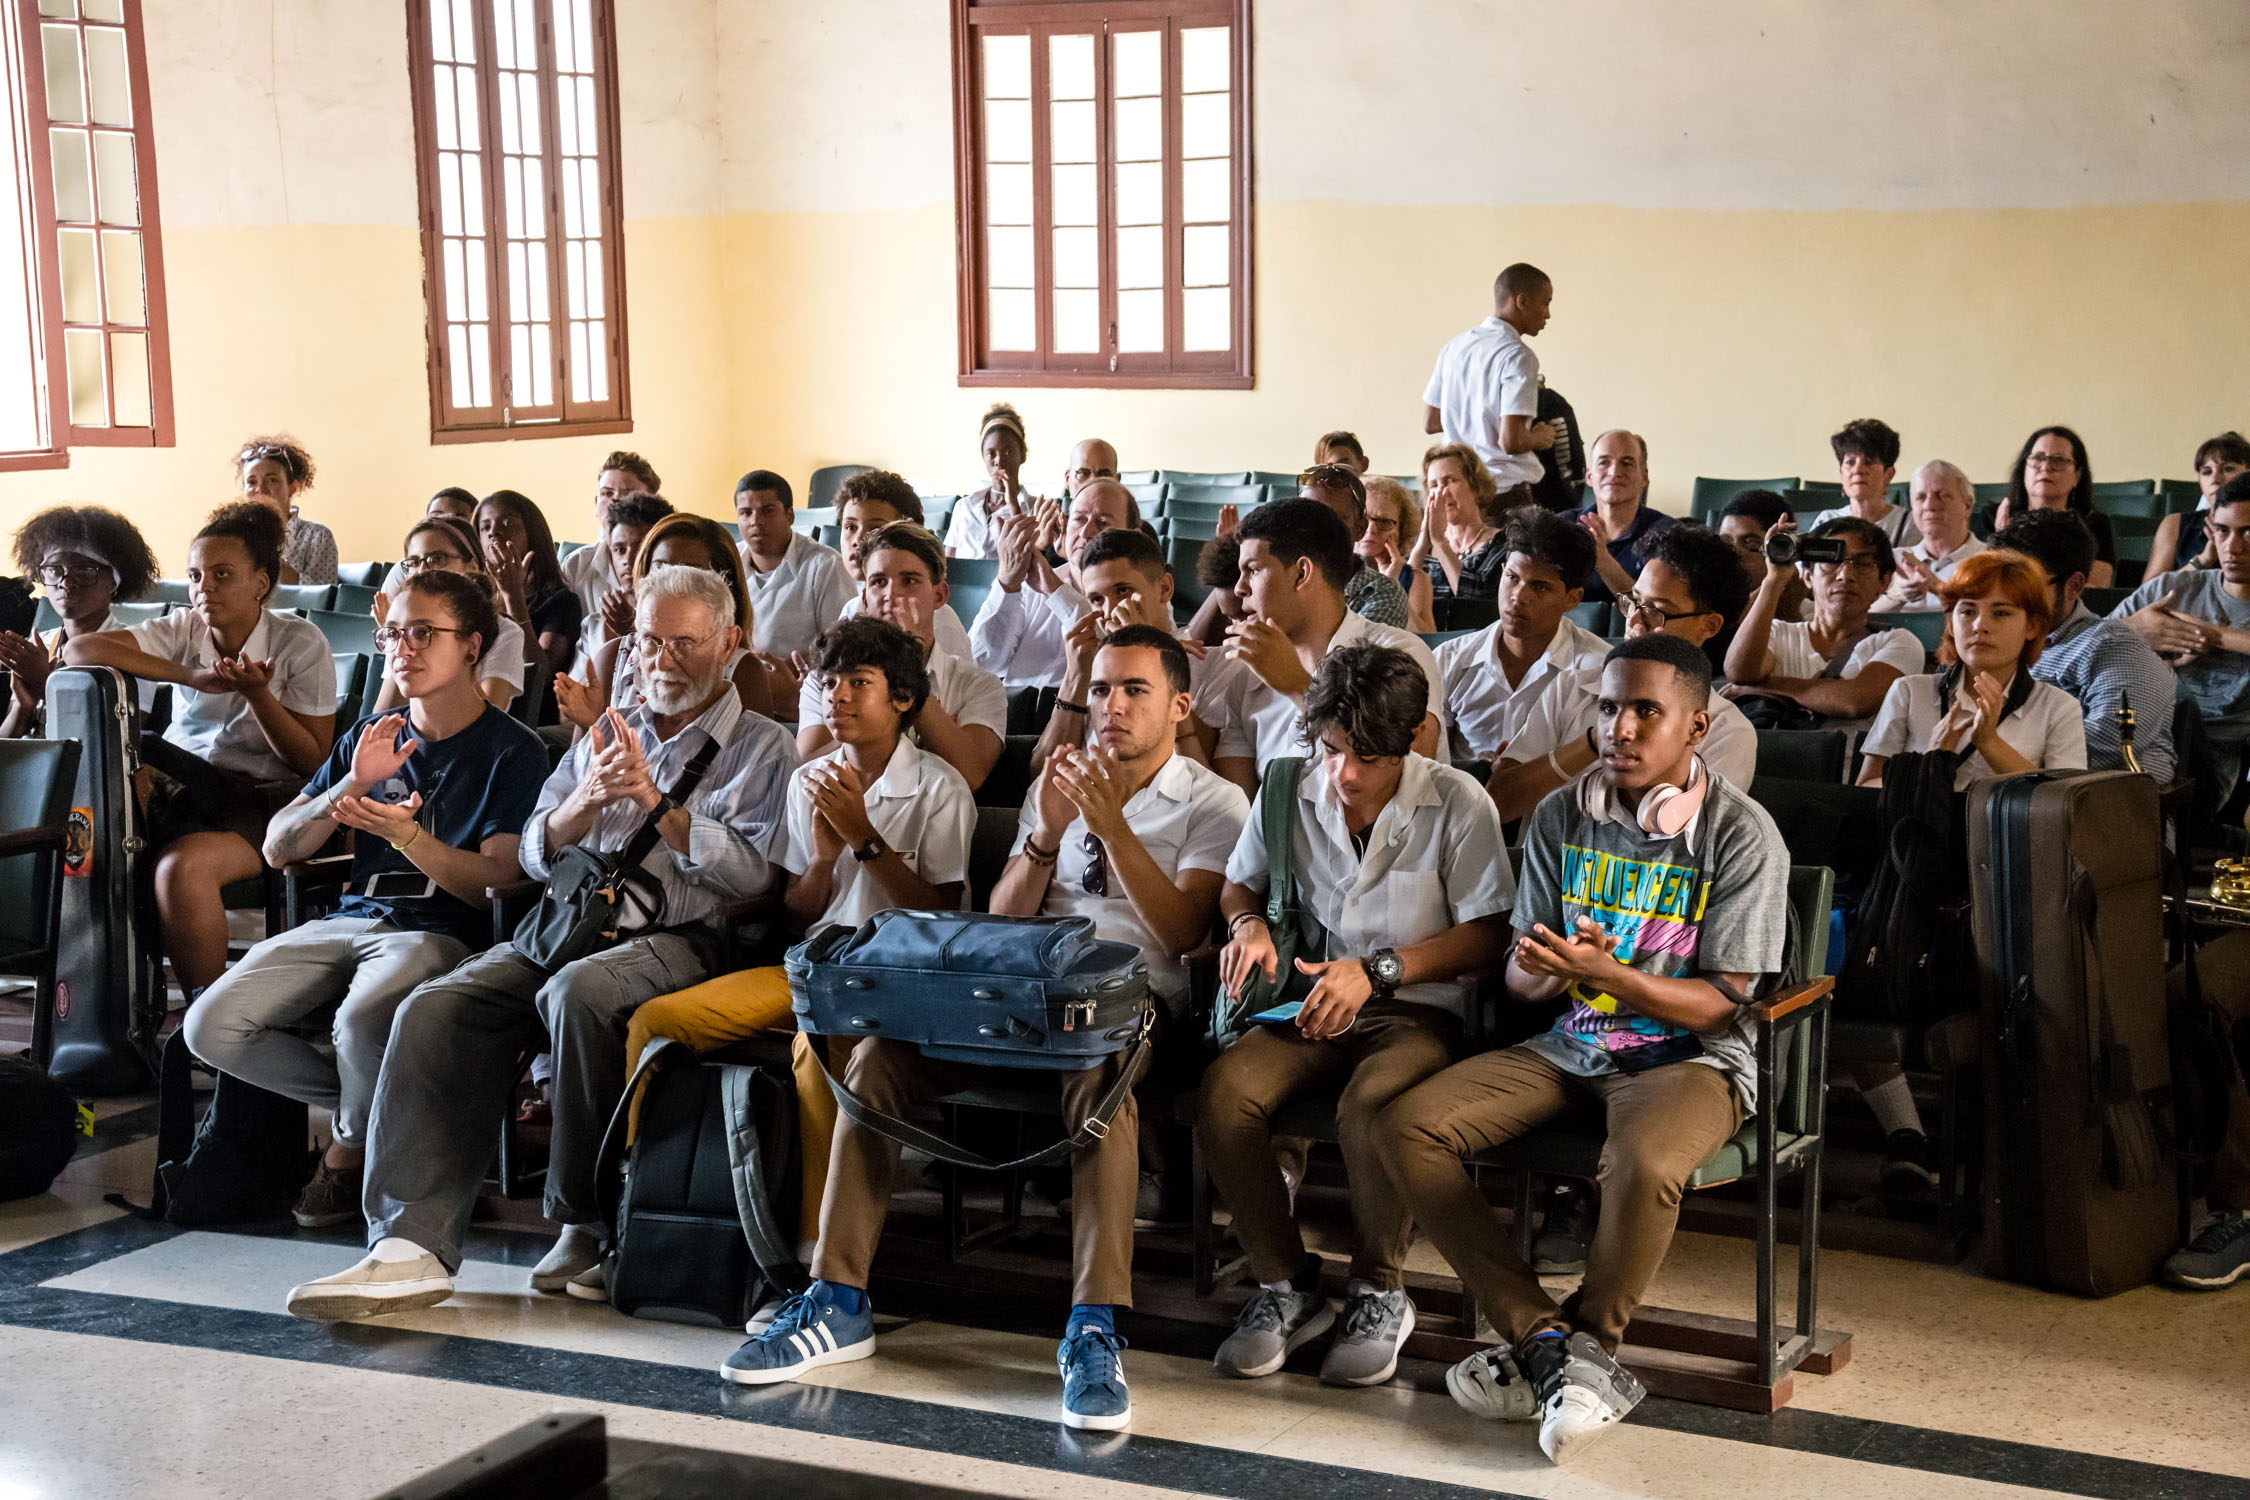 Amadeo Roldan Conservatory students at Dafnis Prieto Sextet master class, Havana, Cuba, January 2019 (Photo by David Garten)